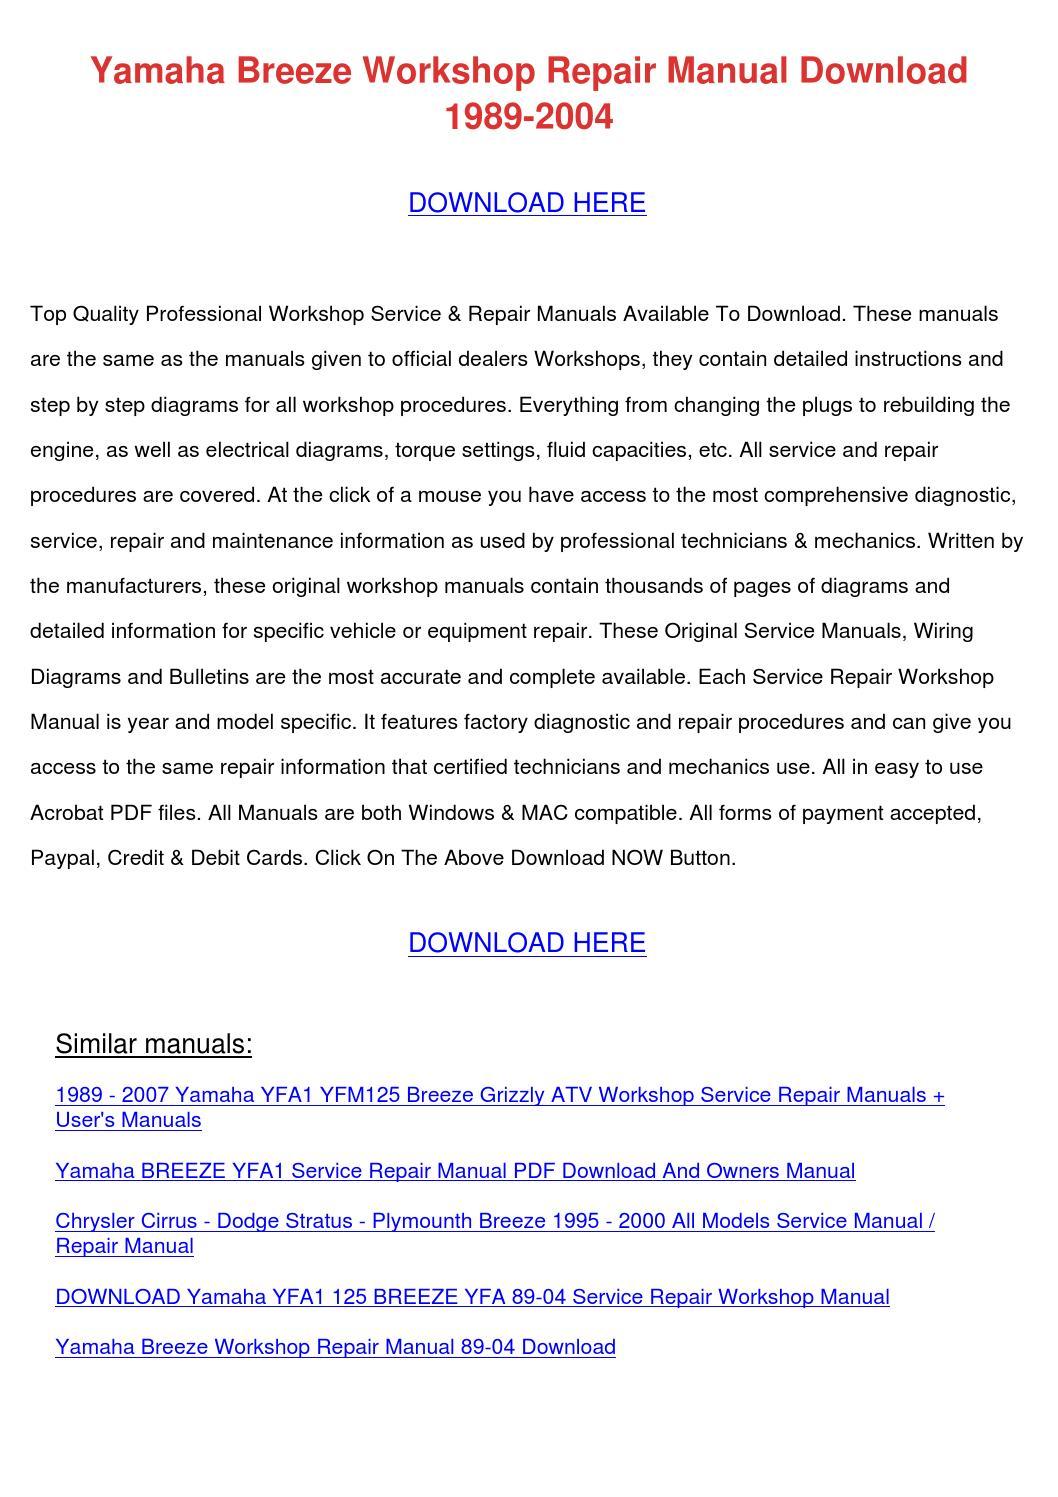 Yamaha Breeze Workshop Repair Manual Download by ... on